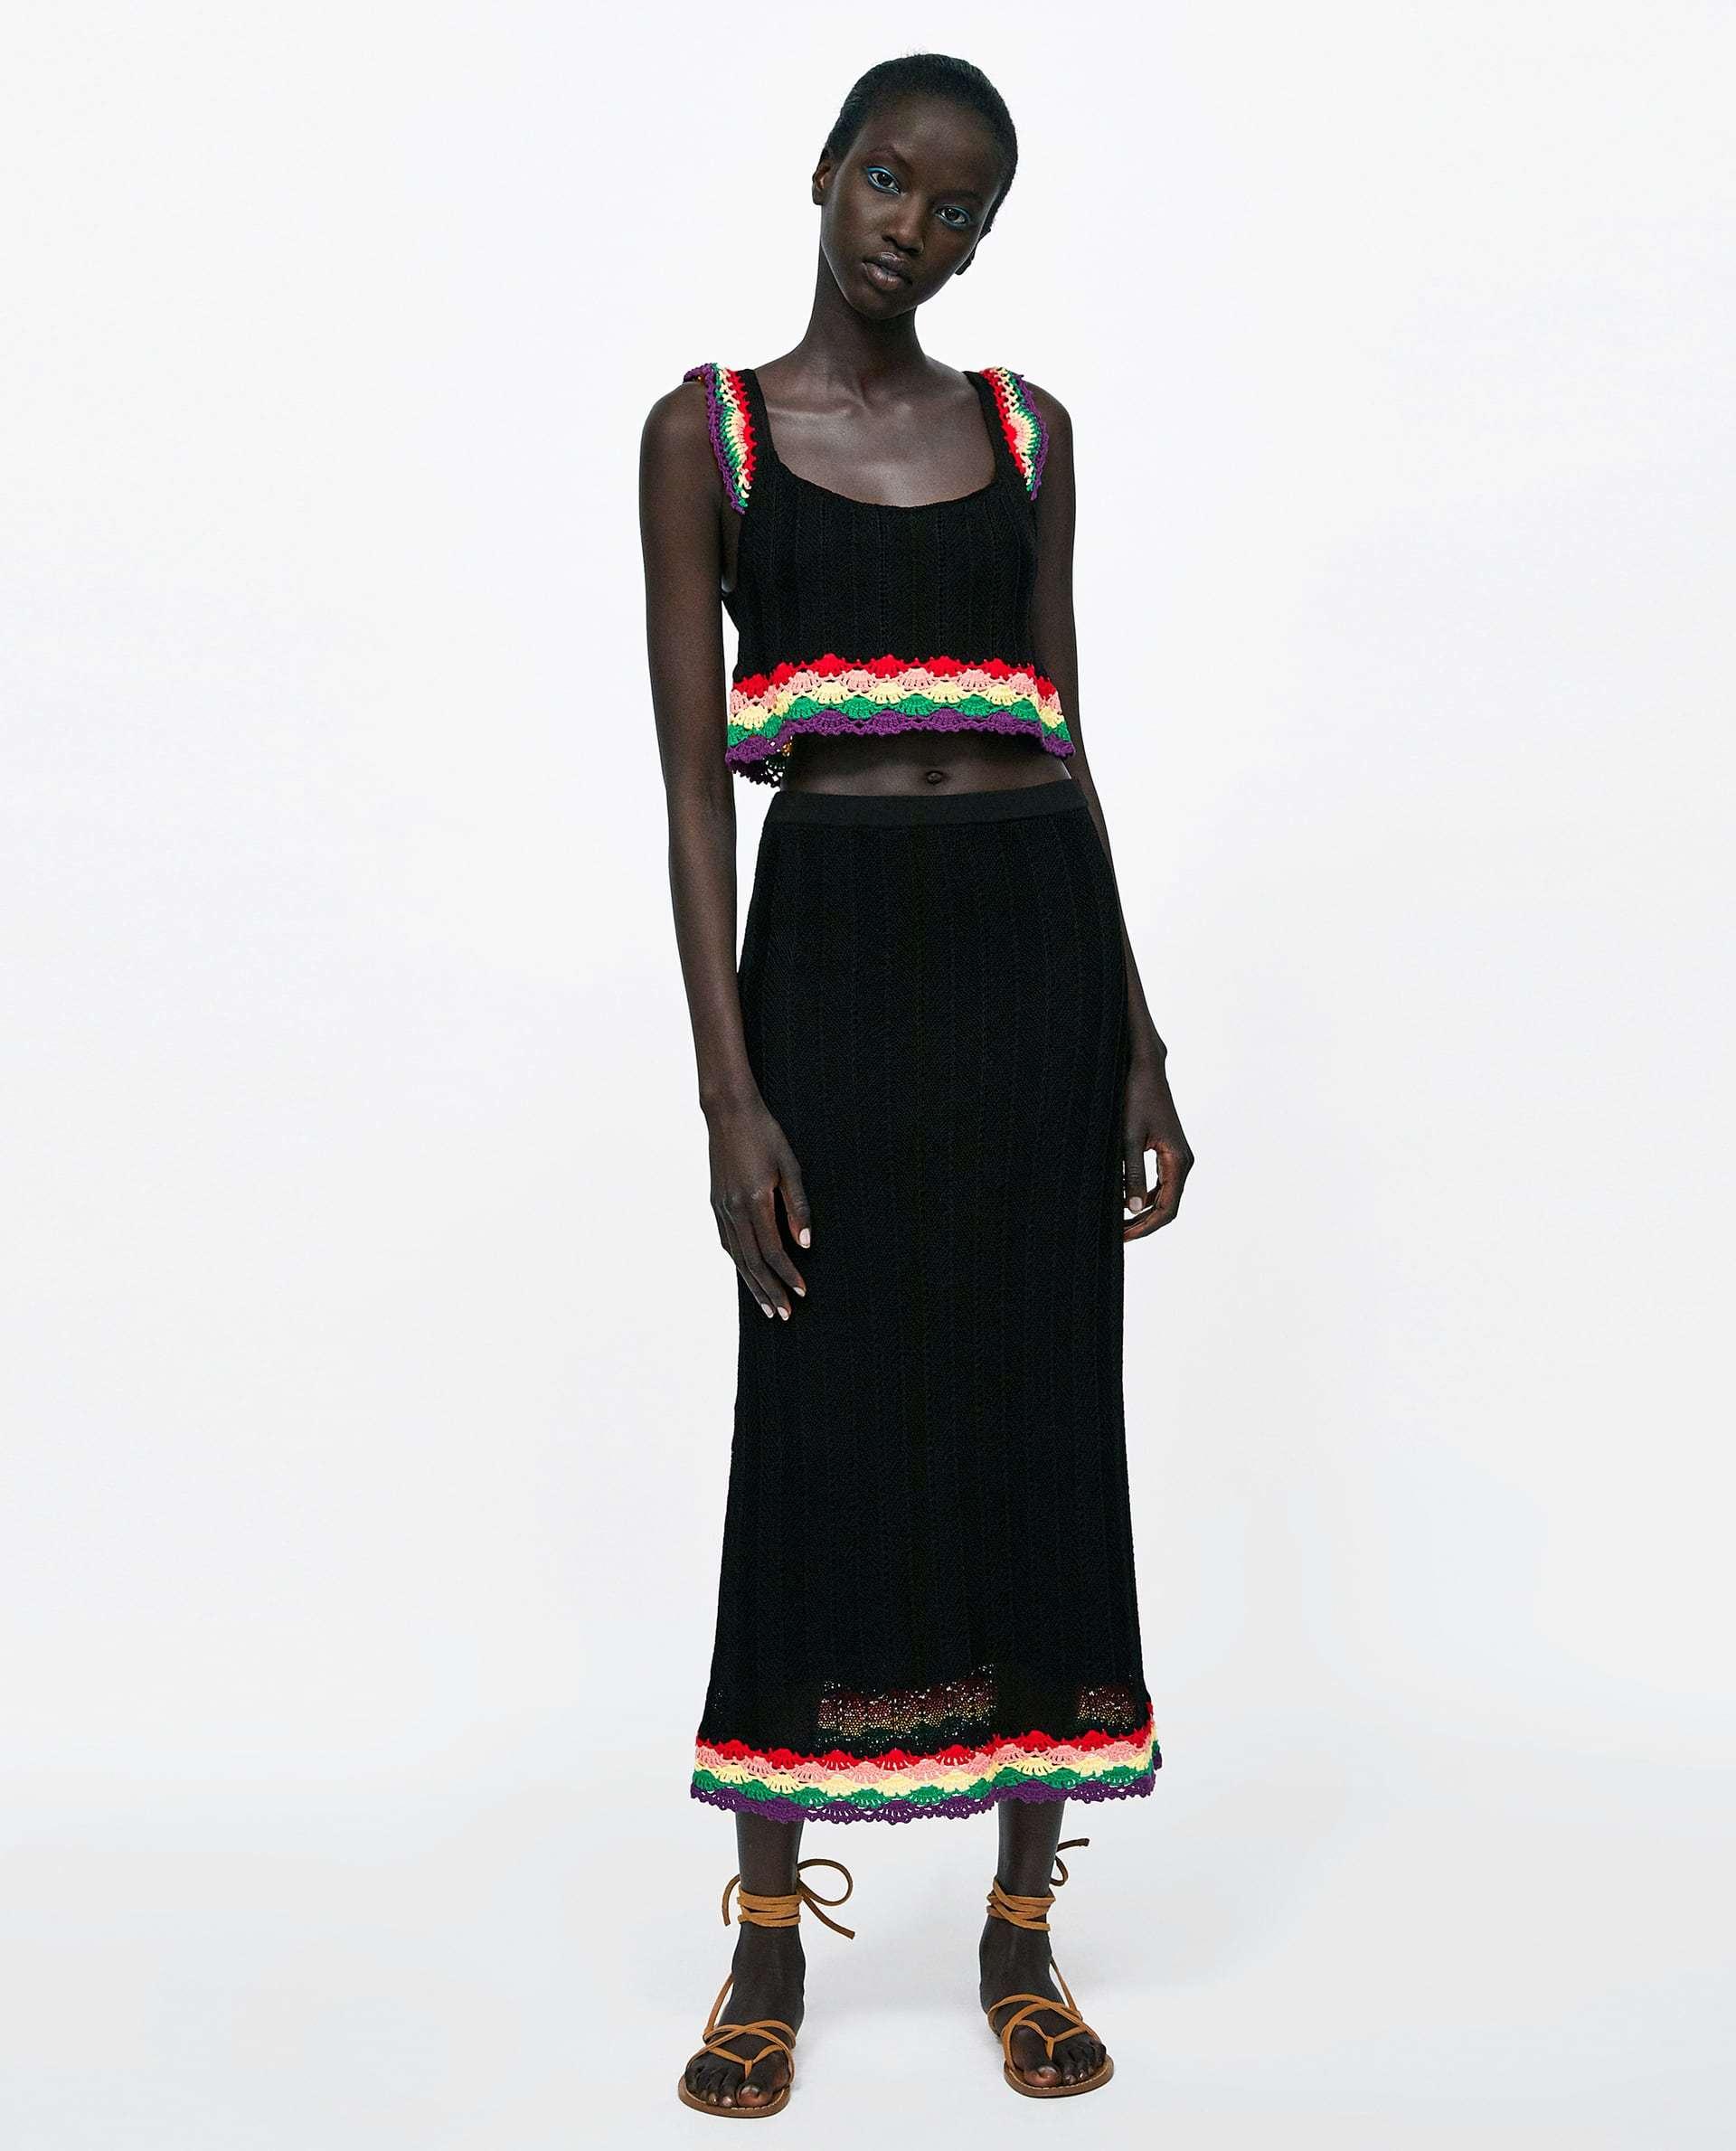 Outfits de moda para triunfar este veranito